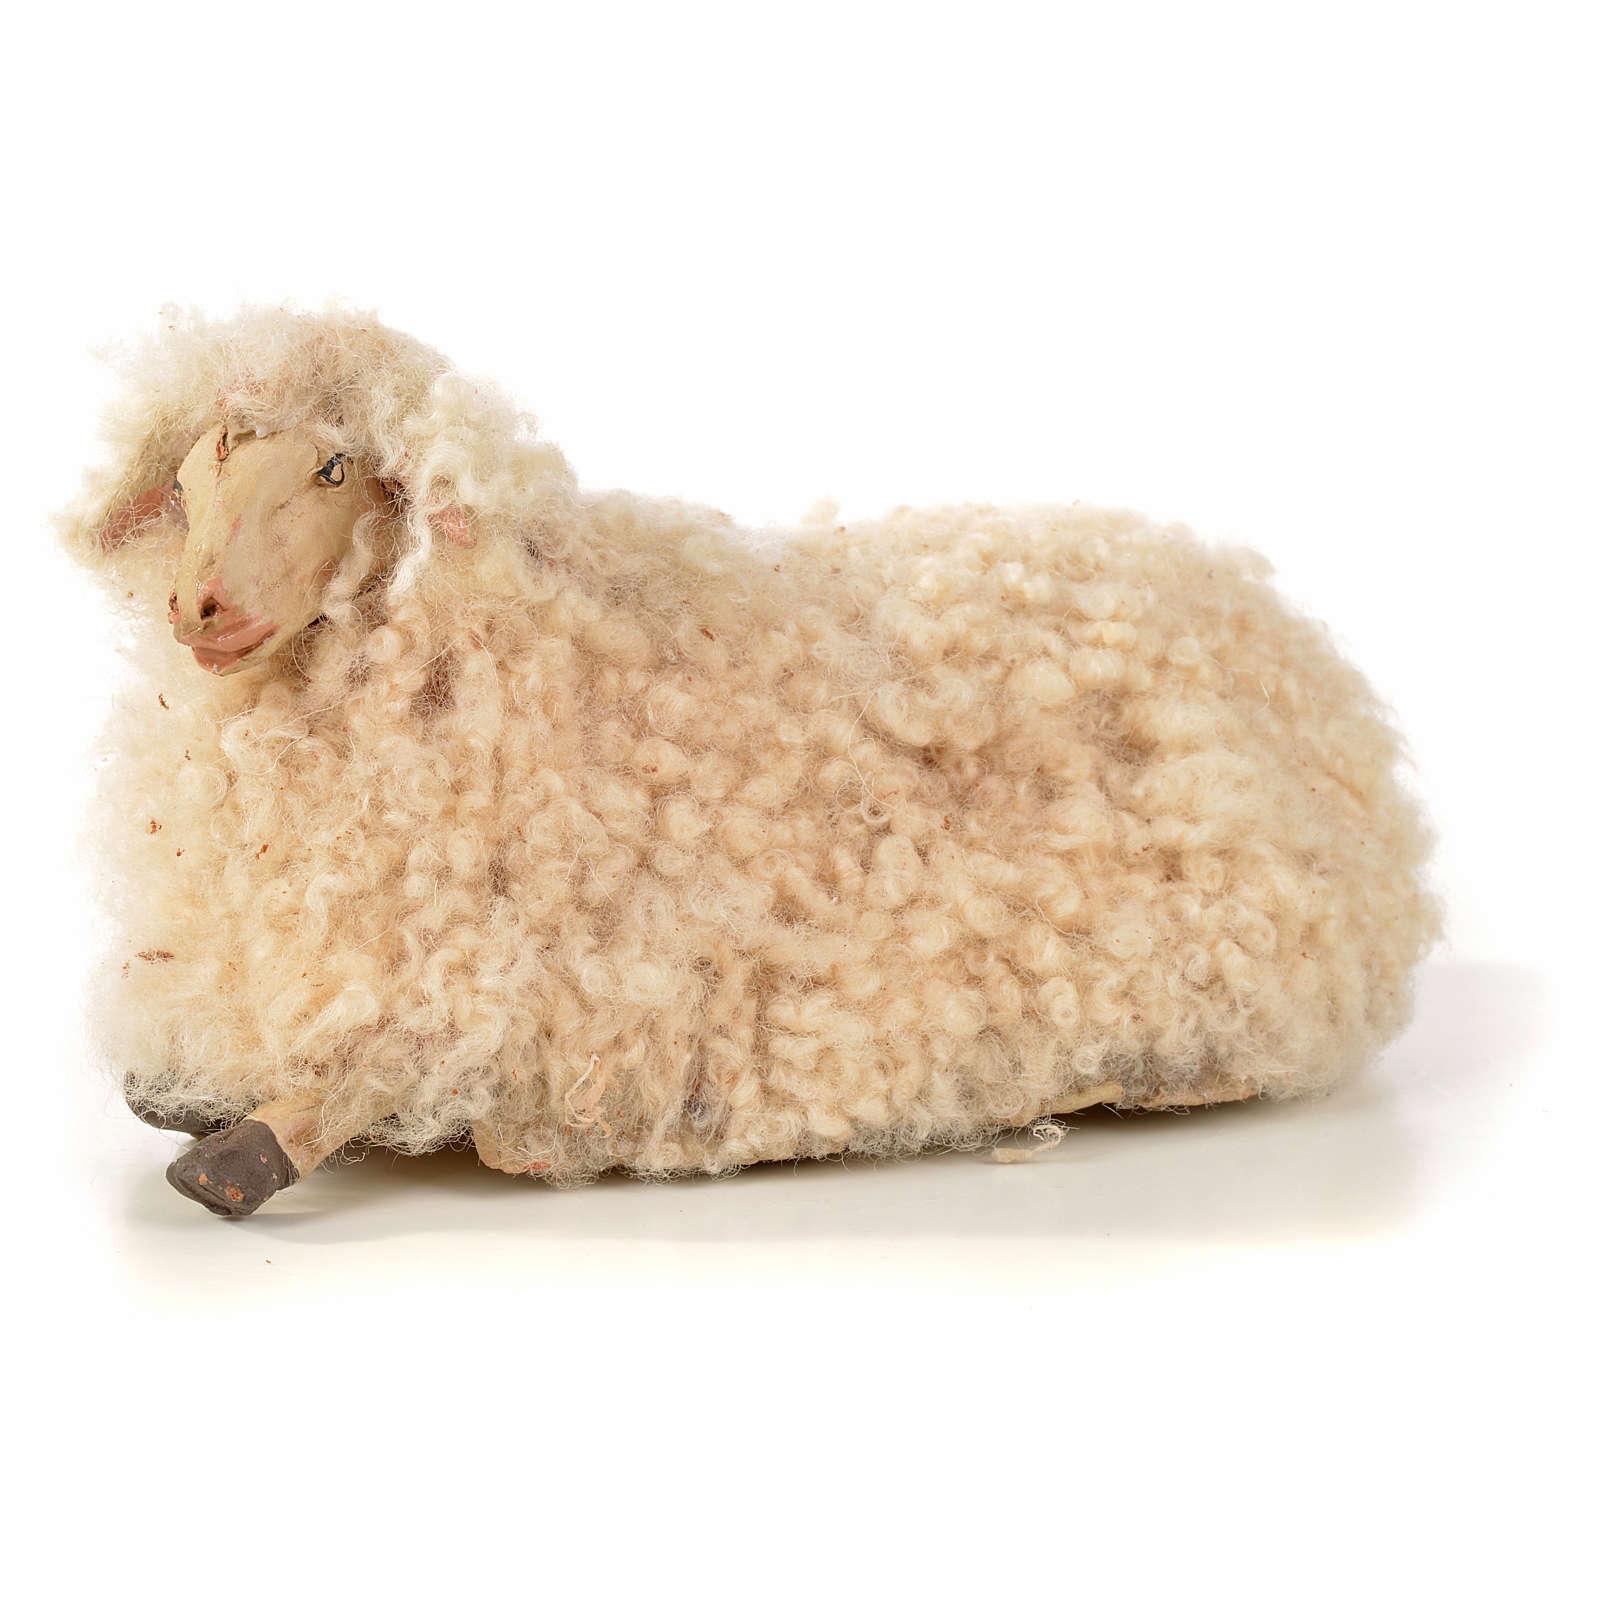 Neapolitan Nativity scene figurine, kit, 3 sheep with wool 18 cm 4